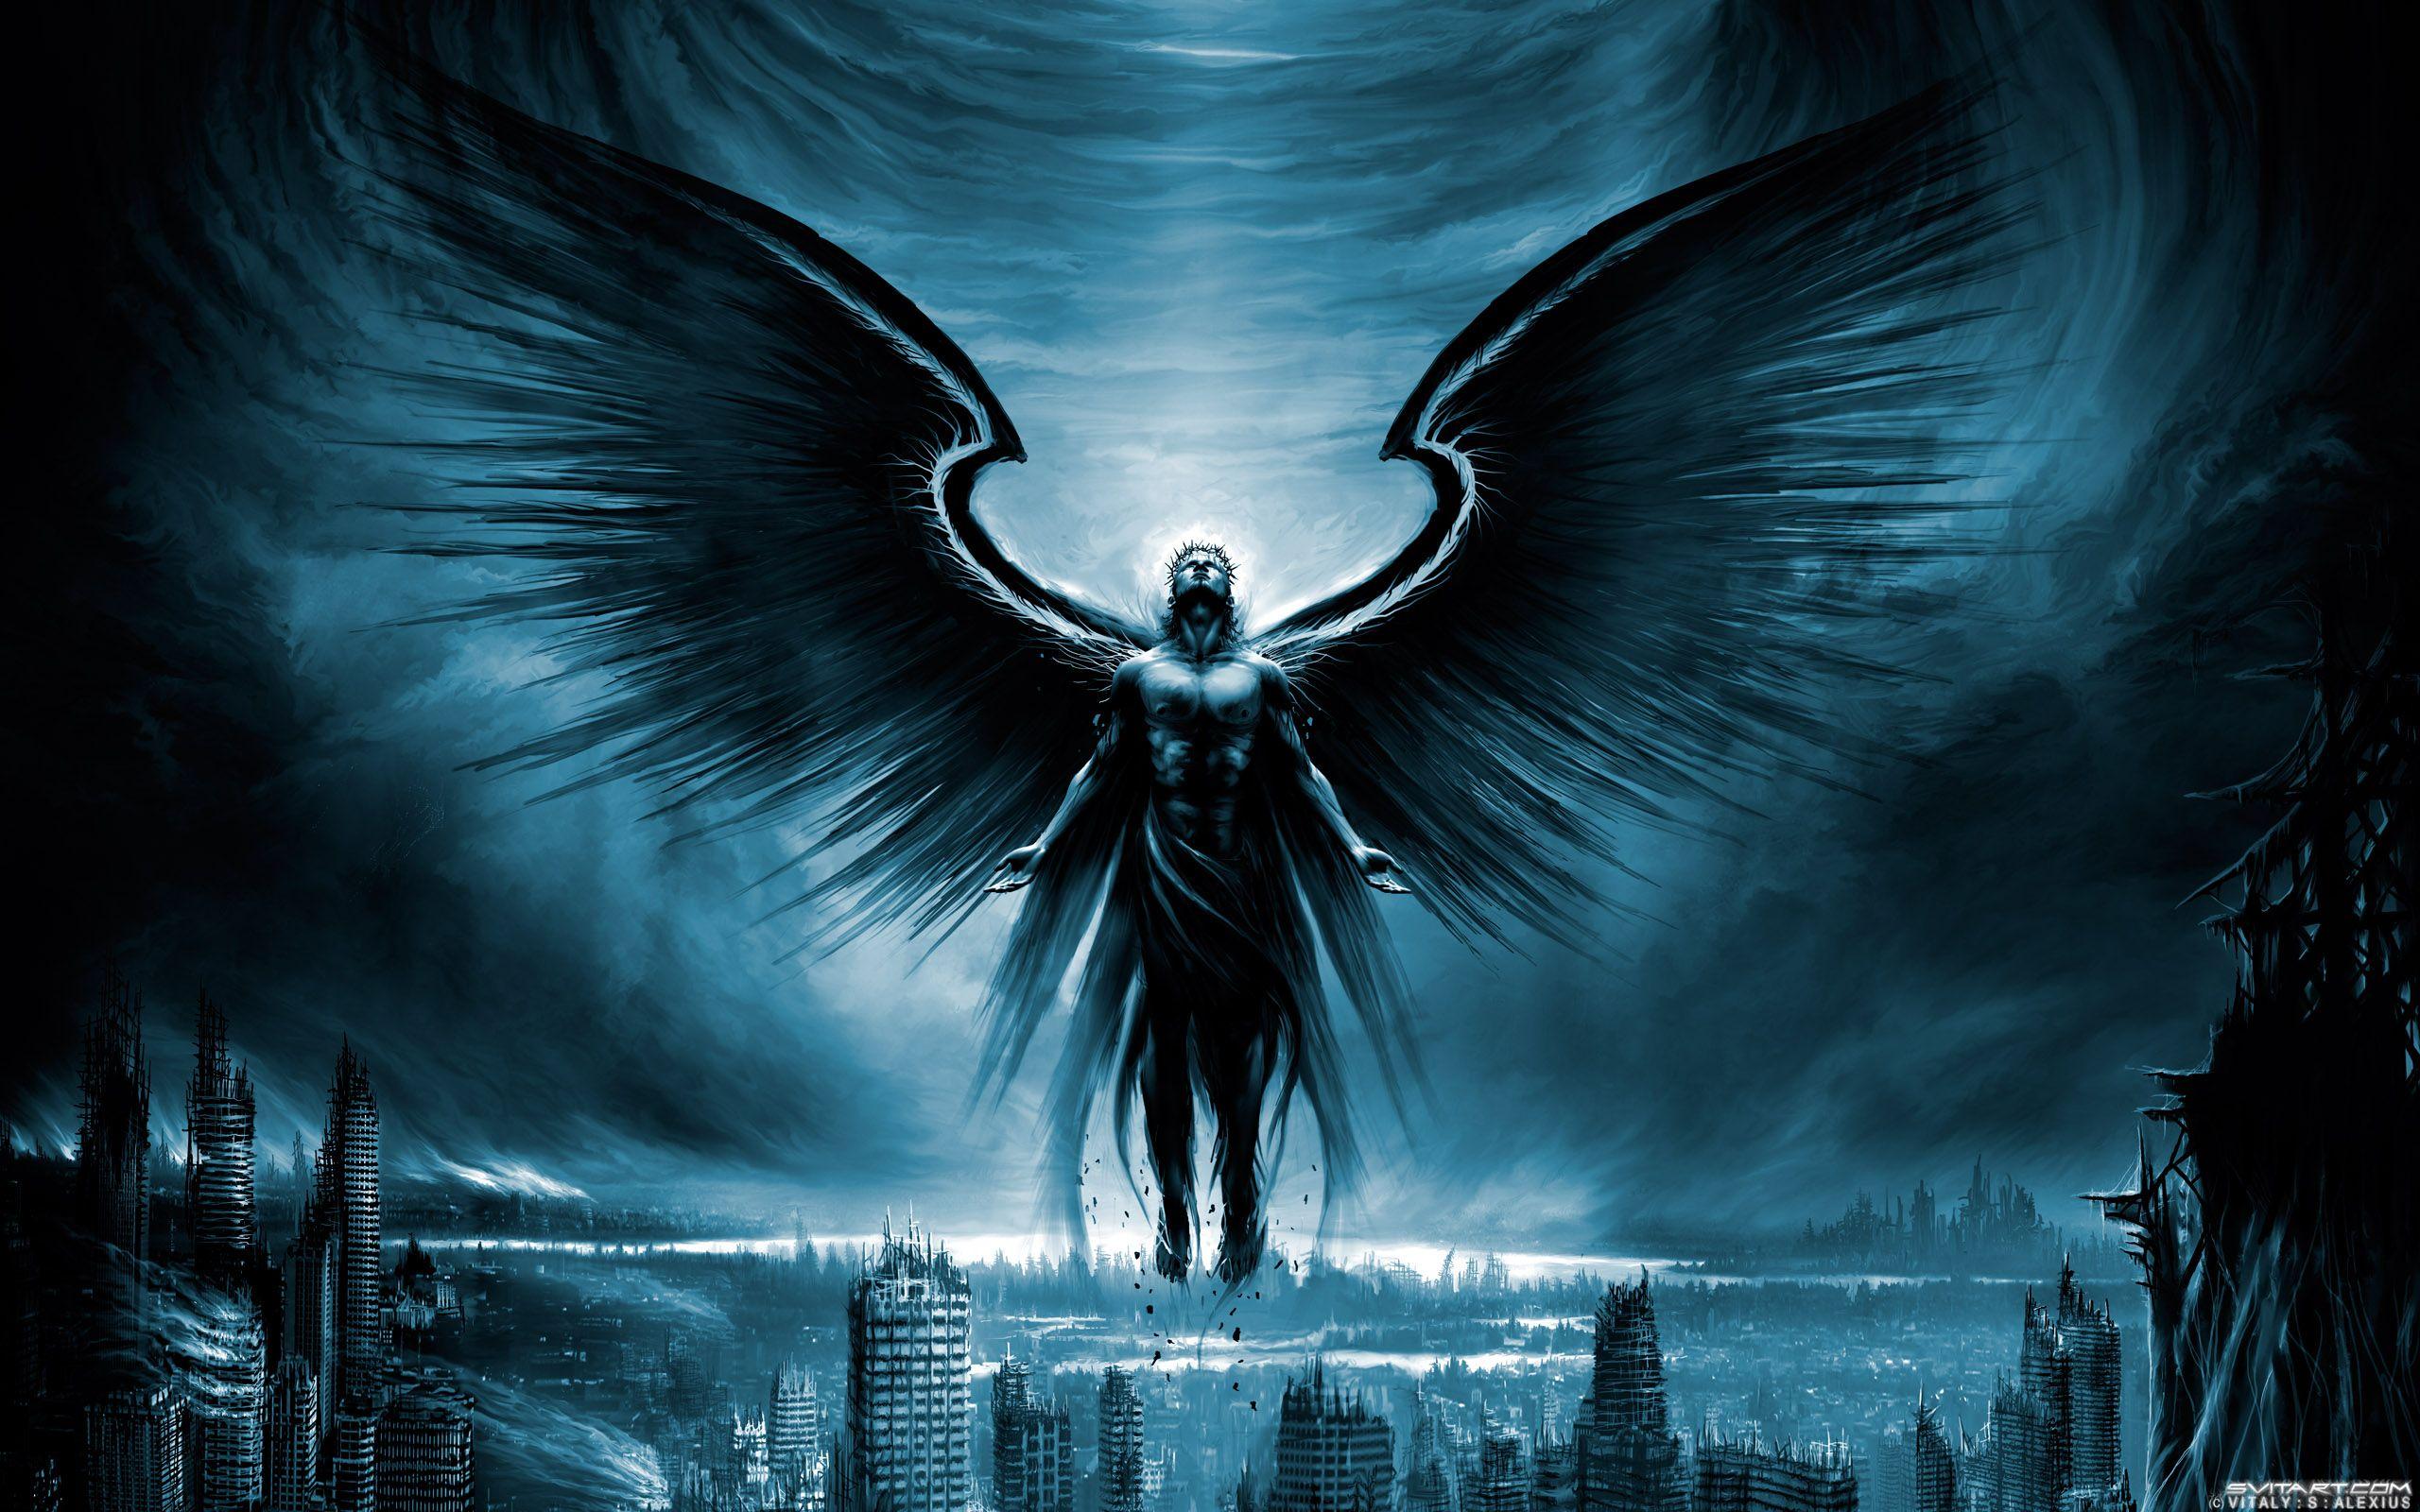 Anime Angel Boy Wallpaper 1080p Boy Vampire Boy With Red Eyes Dark Angel Wallpaper Angel Wallpaper Dark Angel